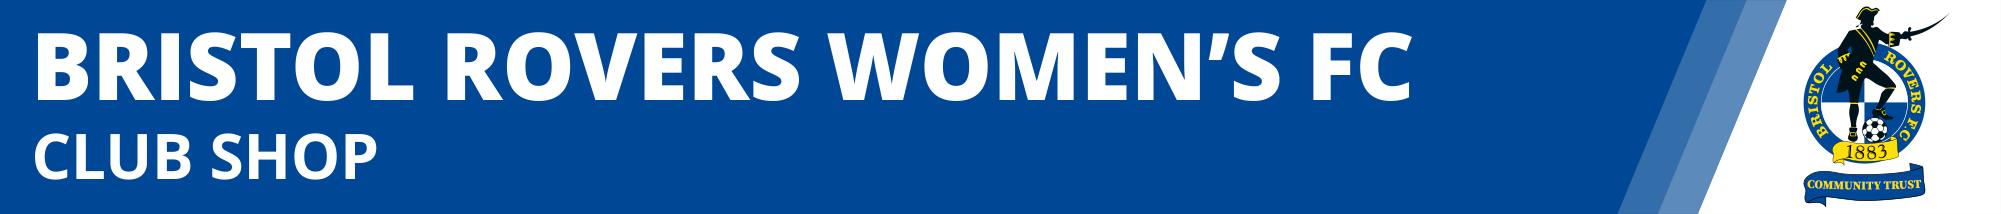 bristol-rovers-women-s-fc-club-shop-banner.png